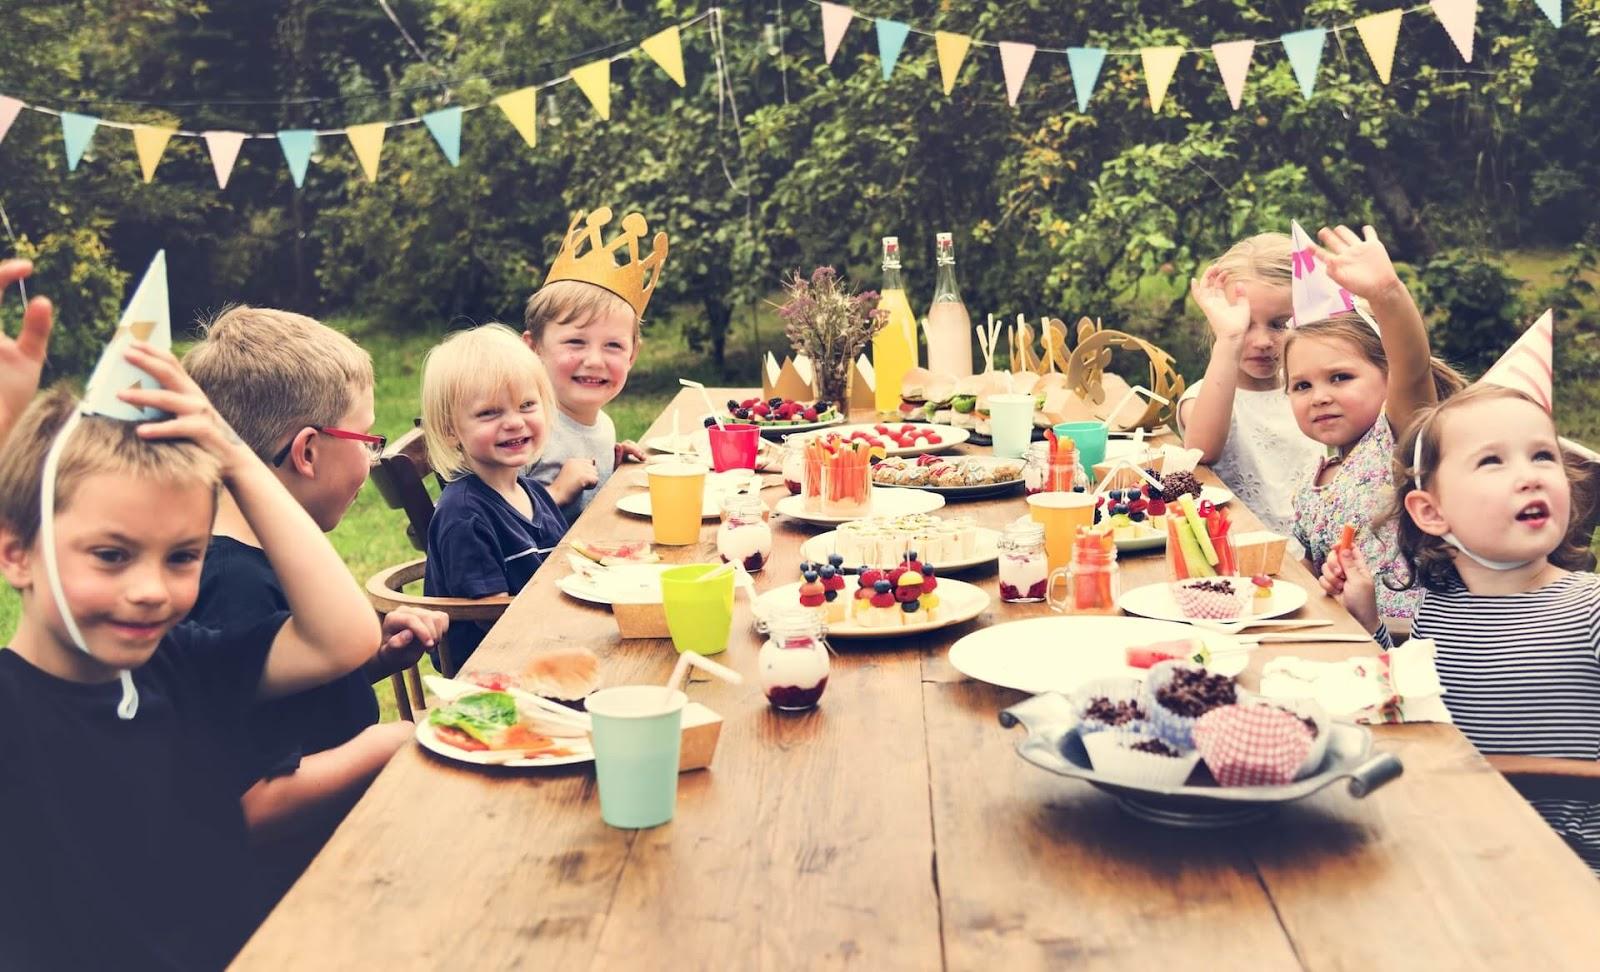 Kids sitting around a table at a backyard birthday